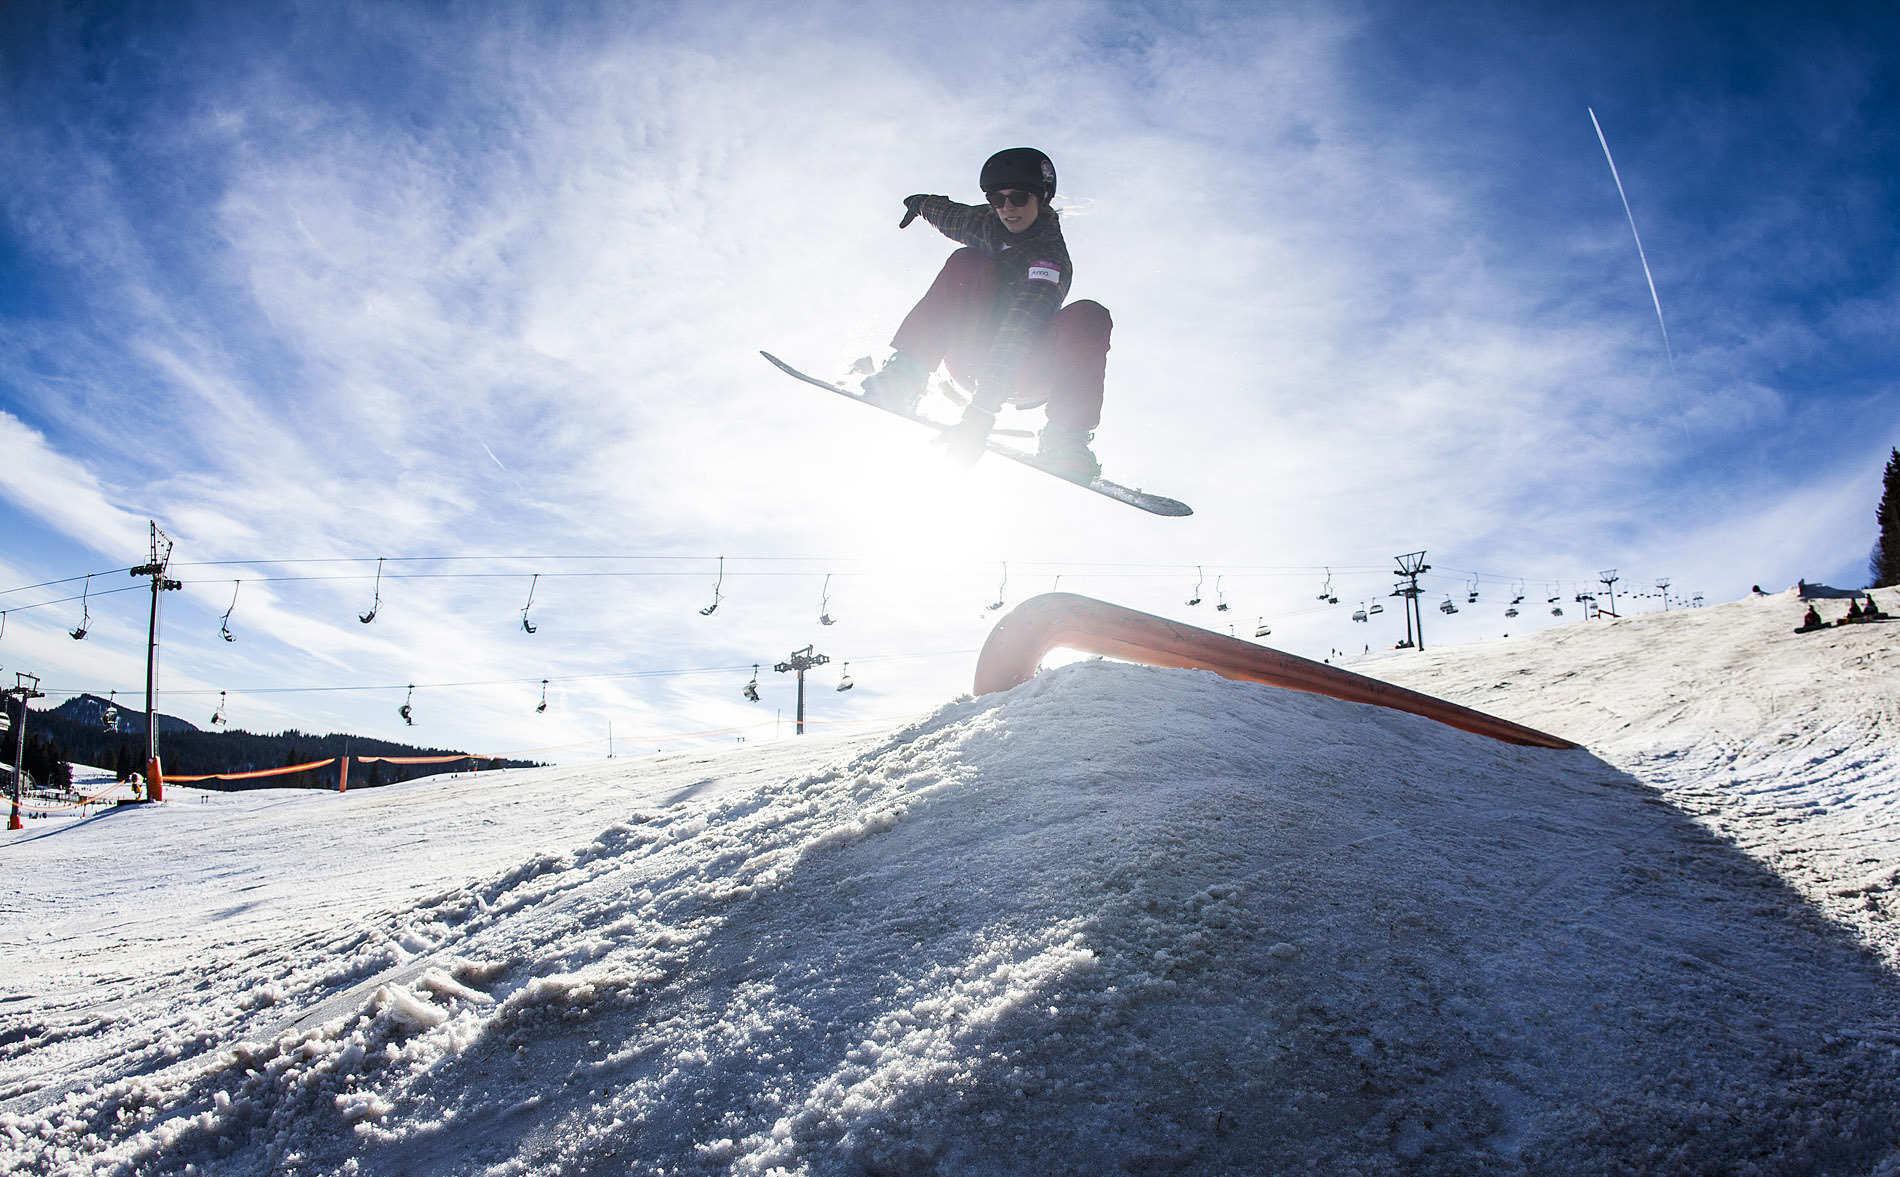 snowpark feldberg 25 02 2017 action sb anna cordes martin herrmann qparks 31